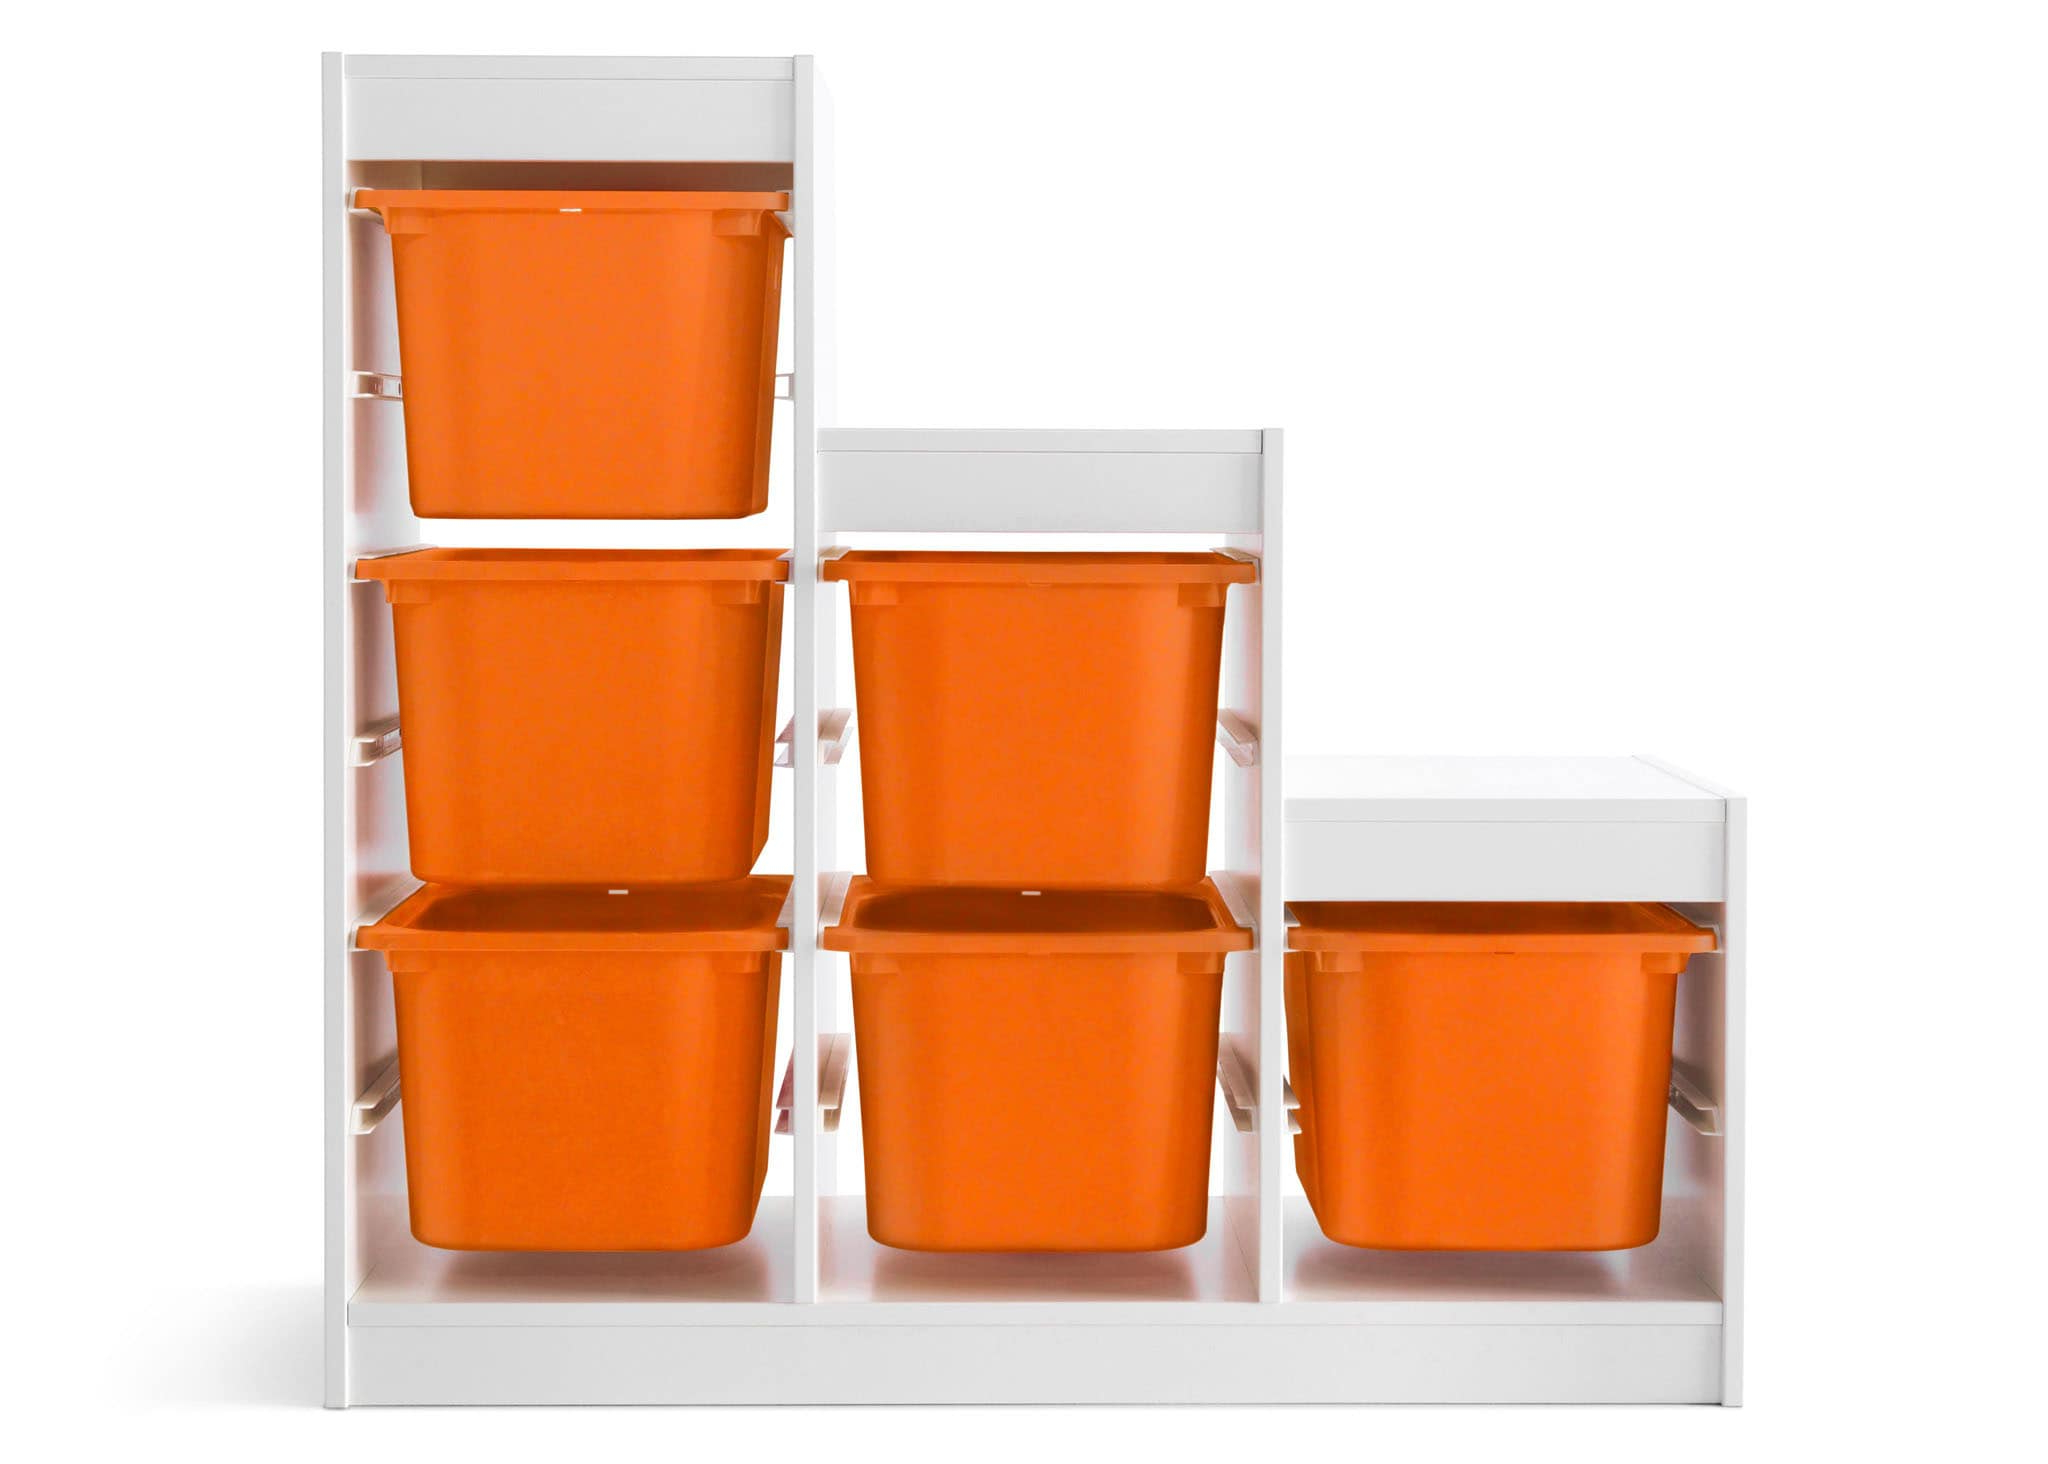 Muebles De Cajones Ikea Ftd8 Muebles Infantiles Y Almacenaje Para Nià Os Pra Online Ikea